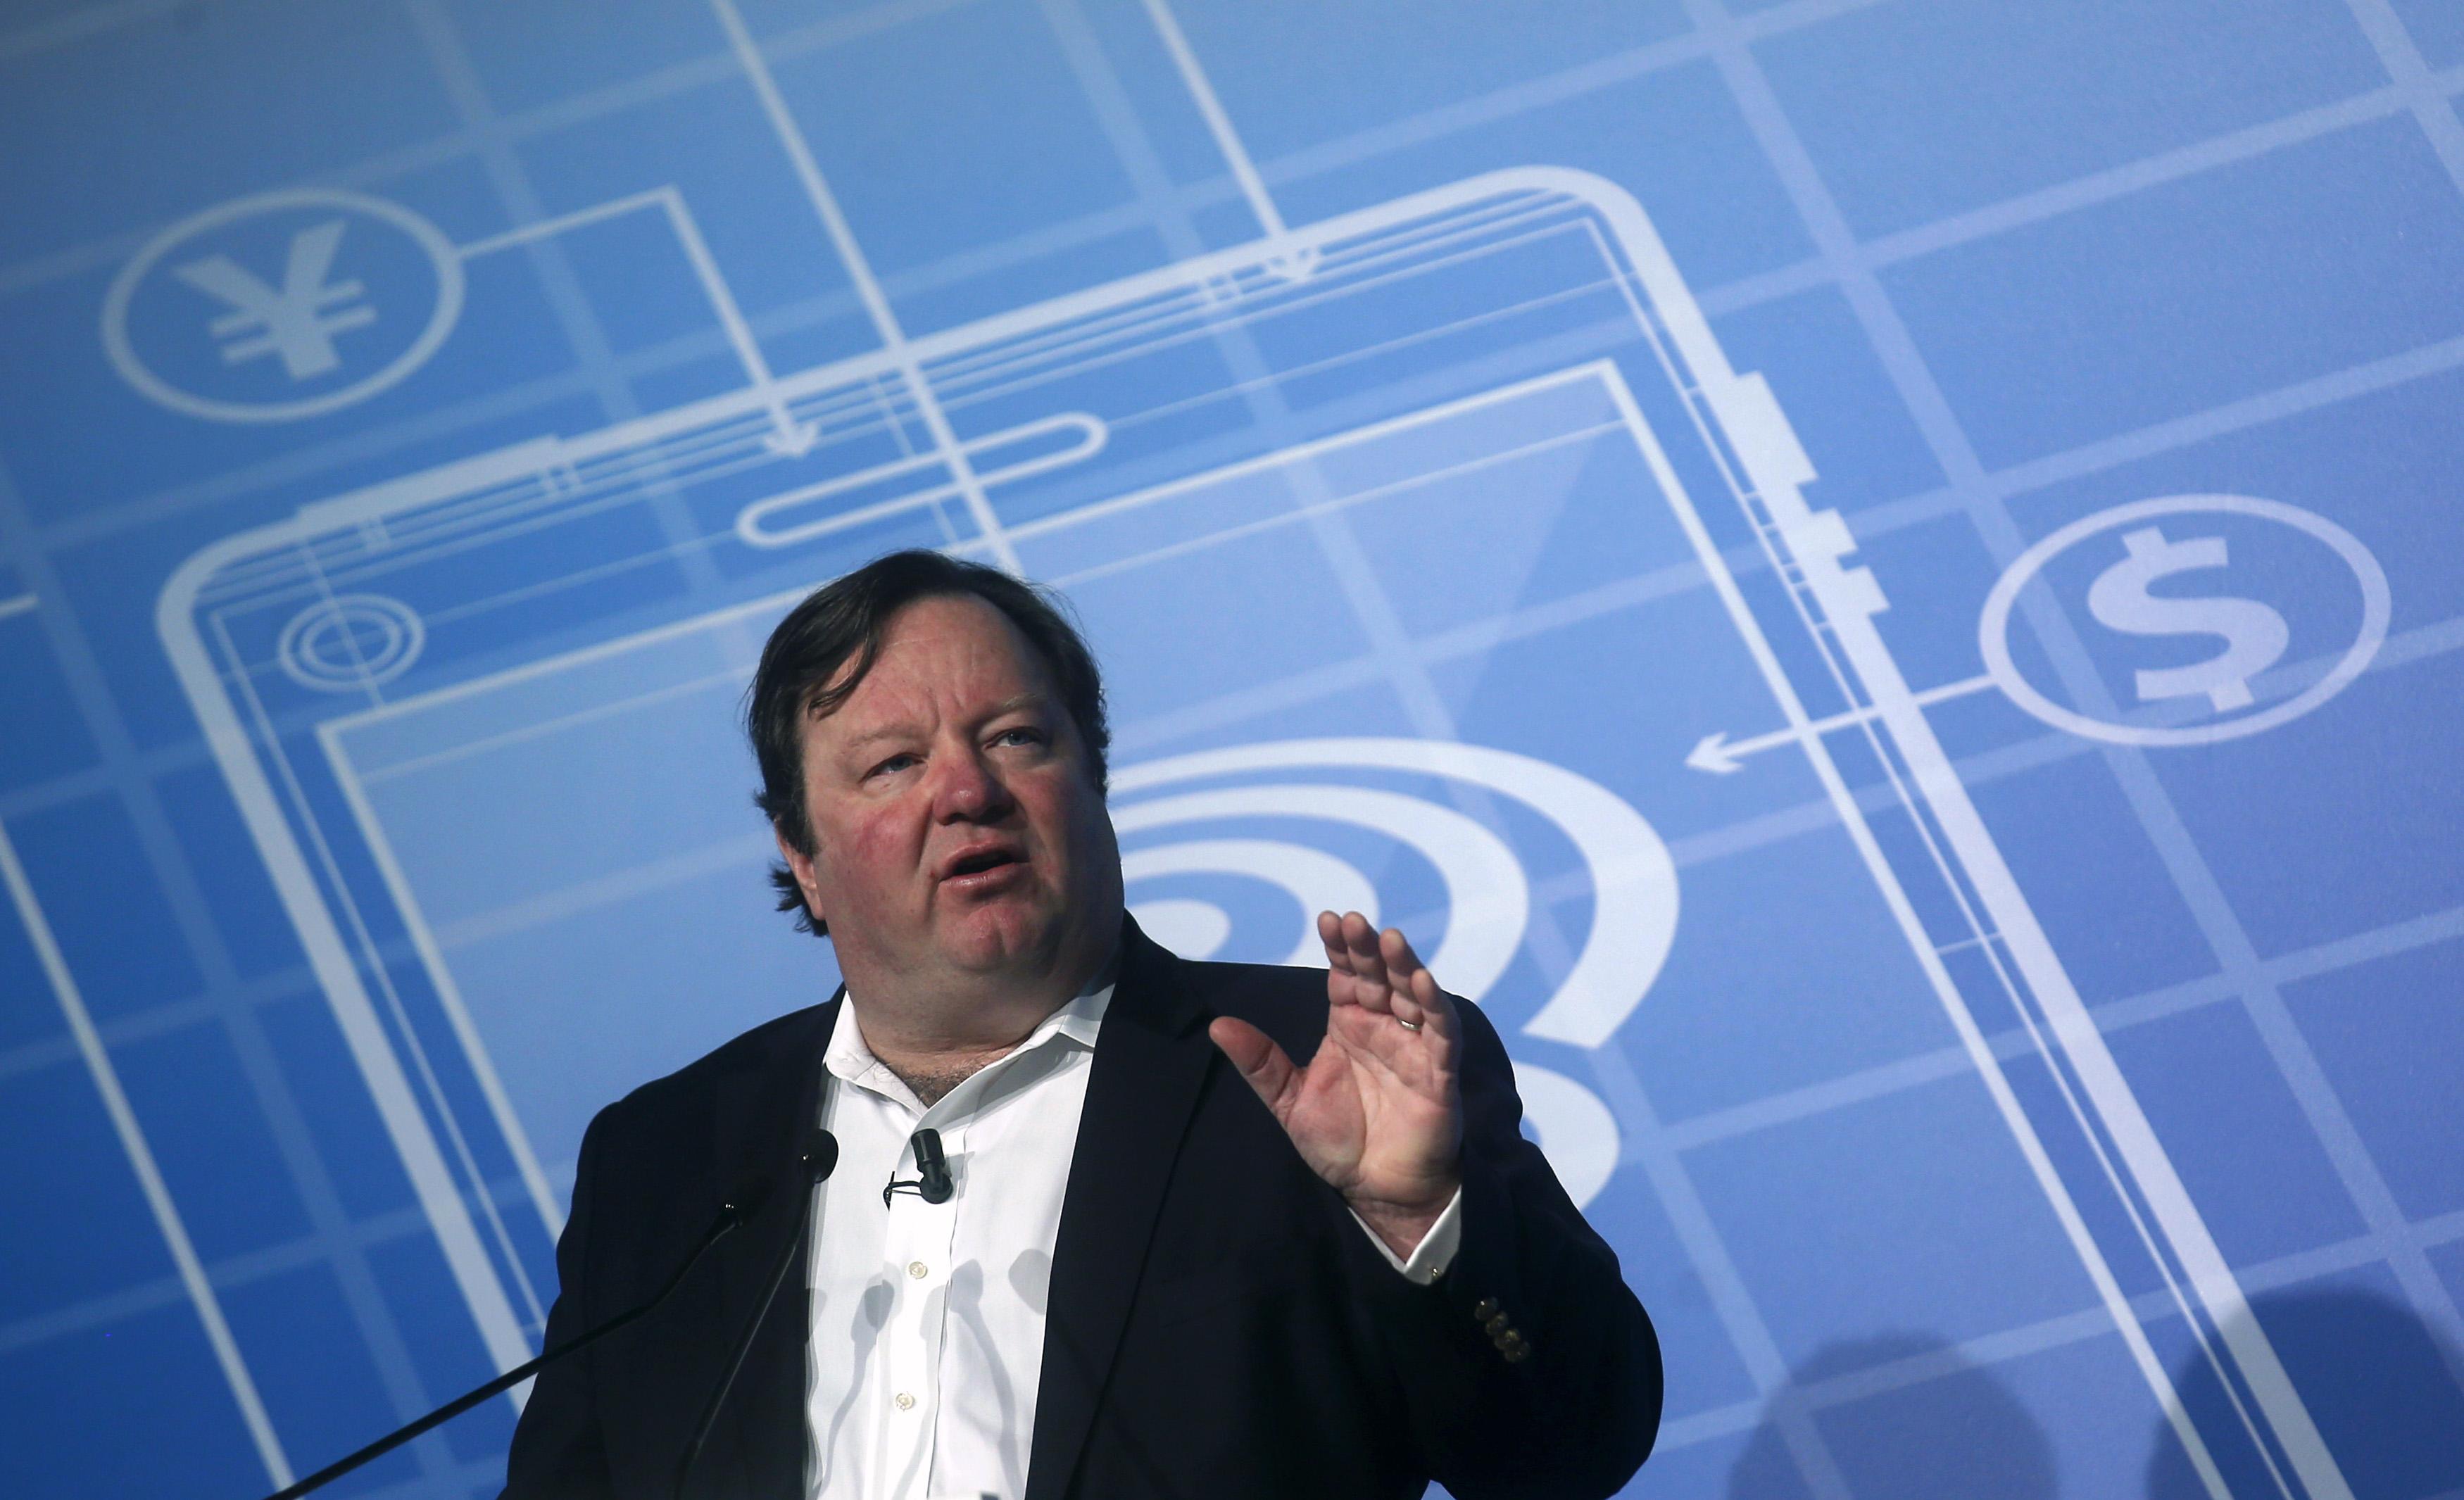 Viacom International Media Networks President and CEO Bakish speaks at the Mobile World Congress in Barcelona